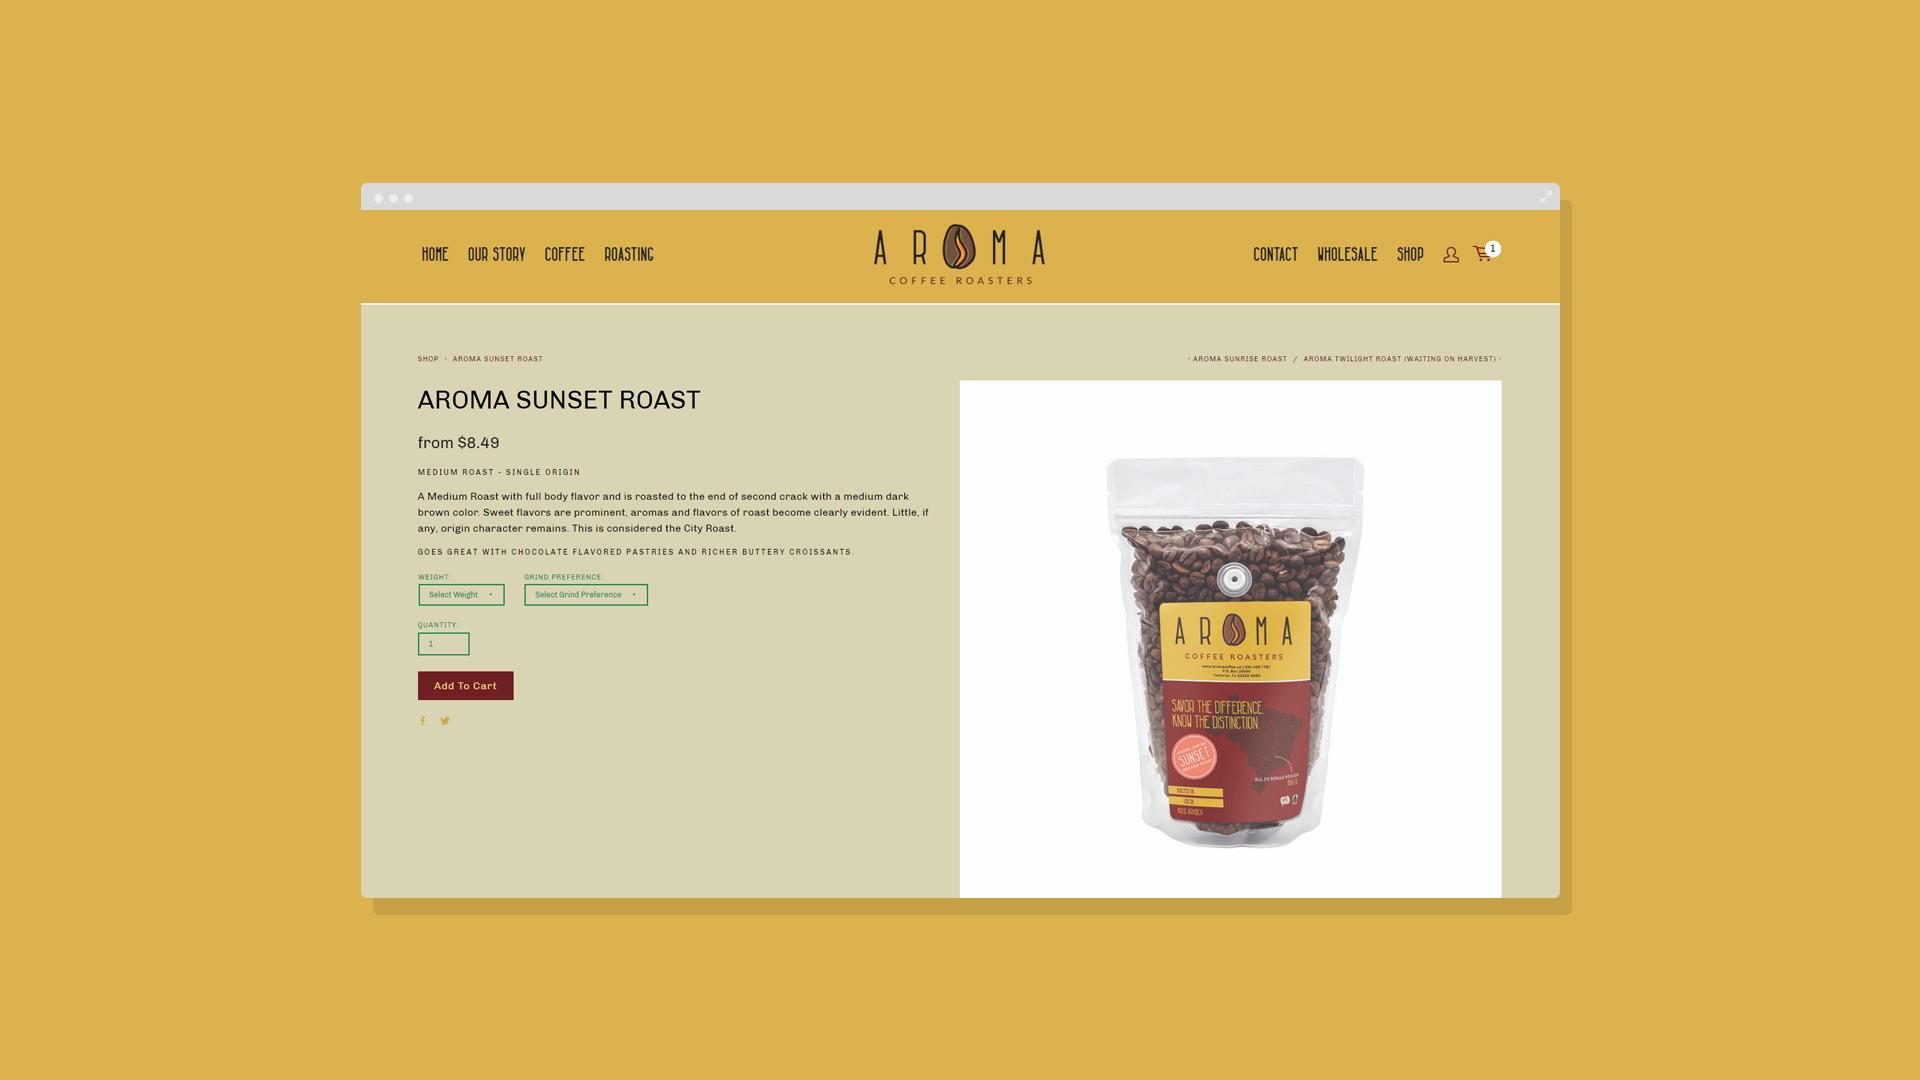 Aroma Coffee Raosters Sunset Roast